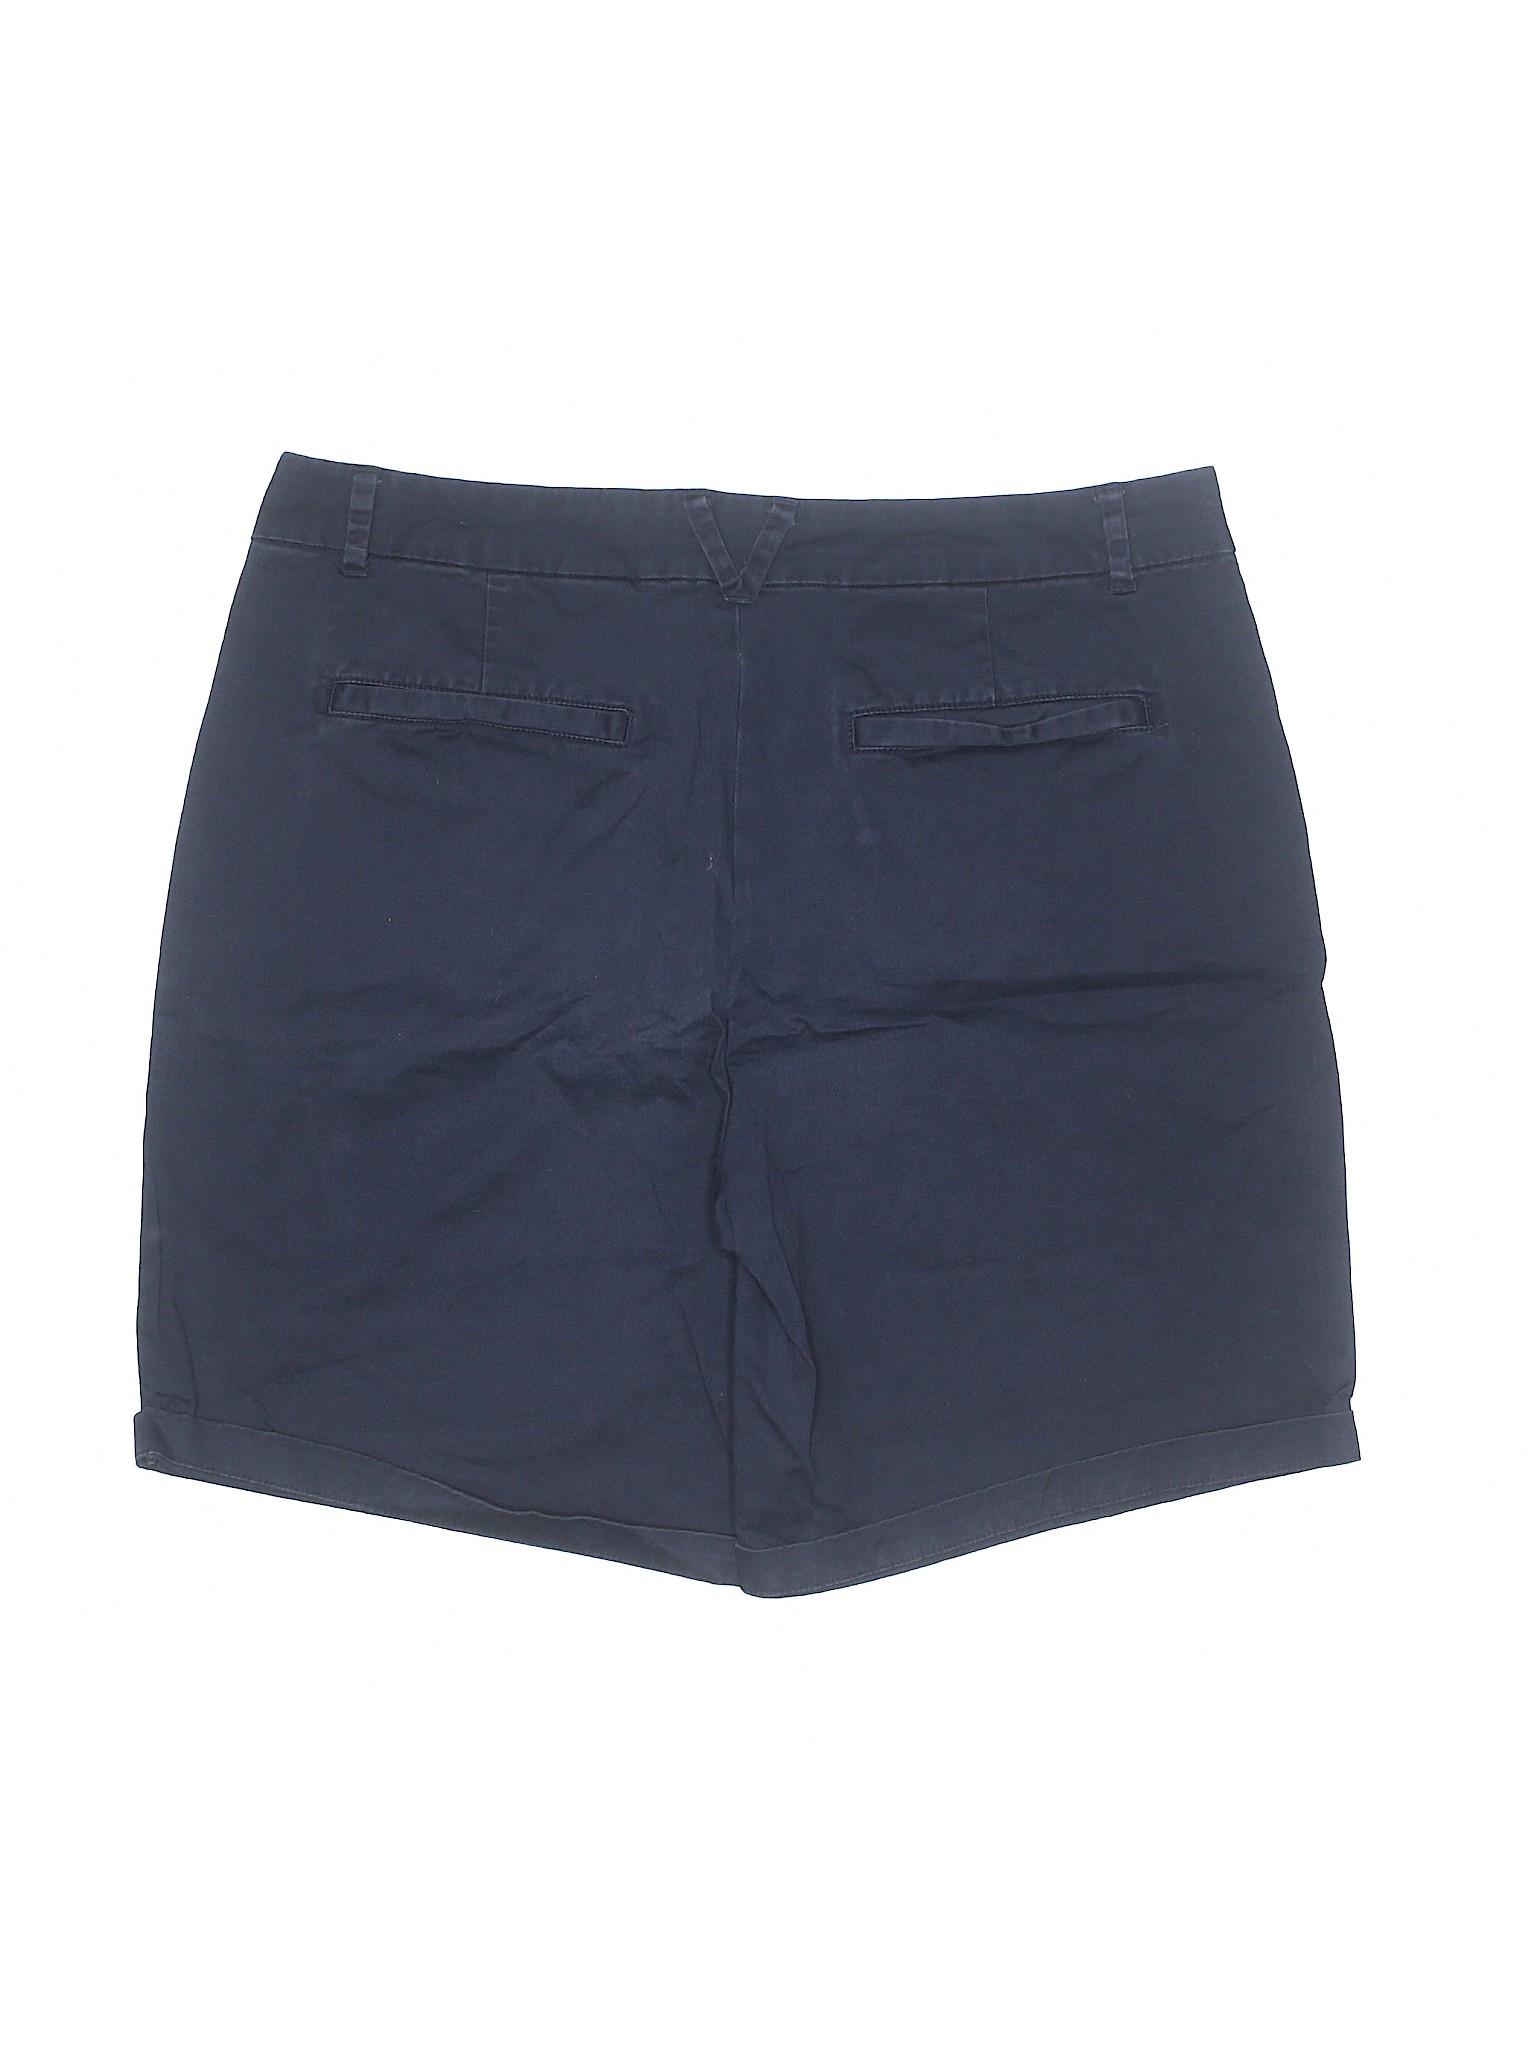 Shorts Boutique Boutique Gap Boutique Shorts Gap Khaki Khaki Gap Khaki wzqTAS